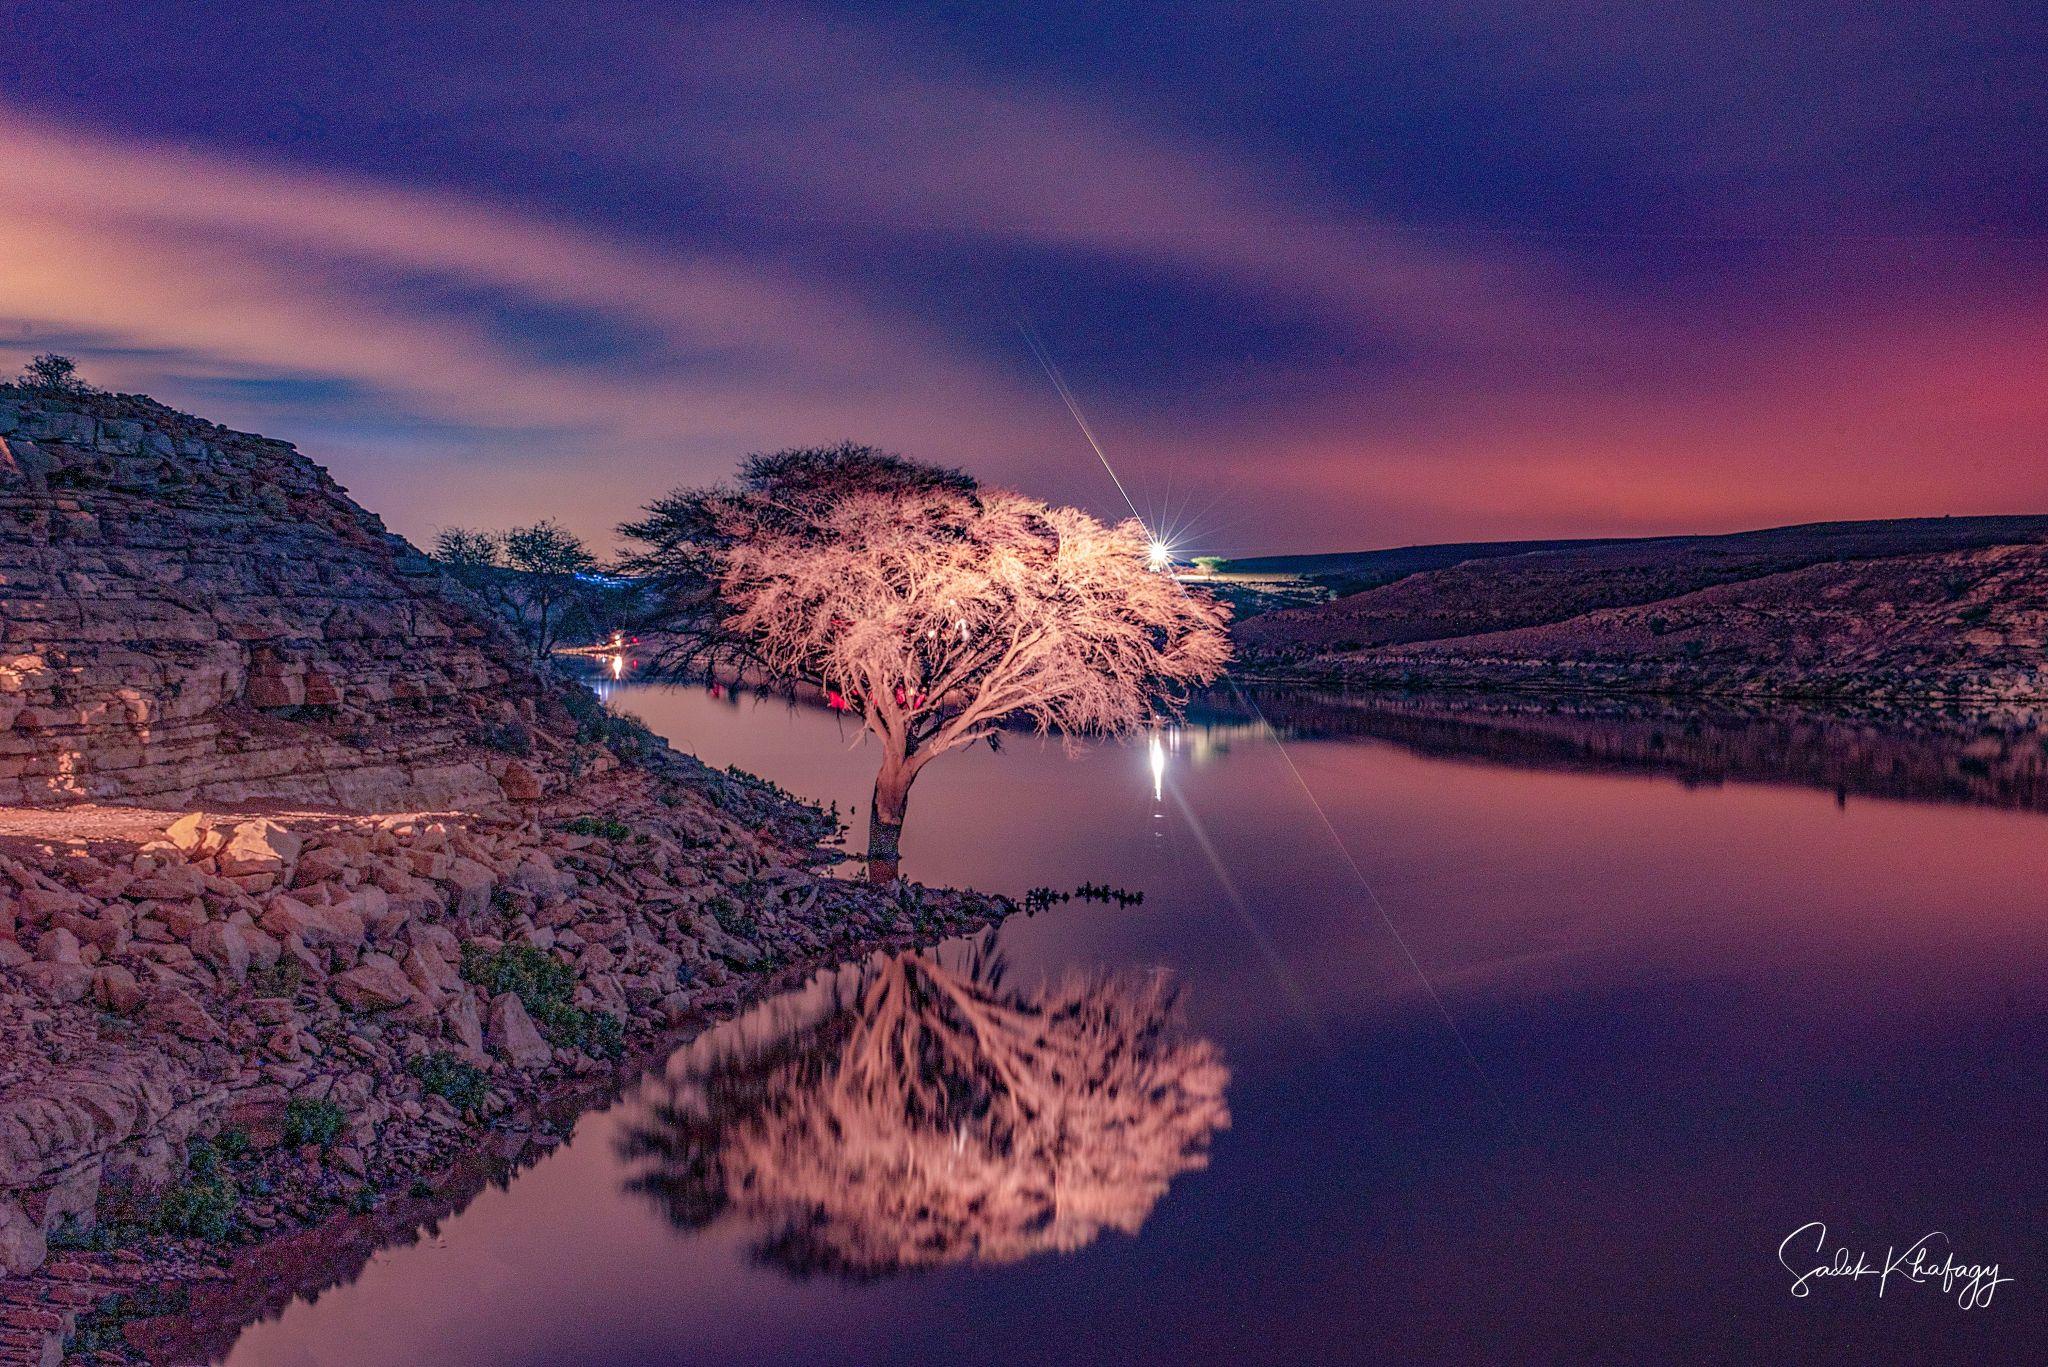 Salboukh Biggest tree, Saudi Arabia